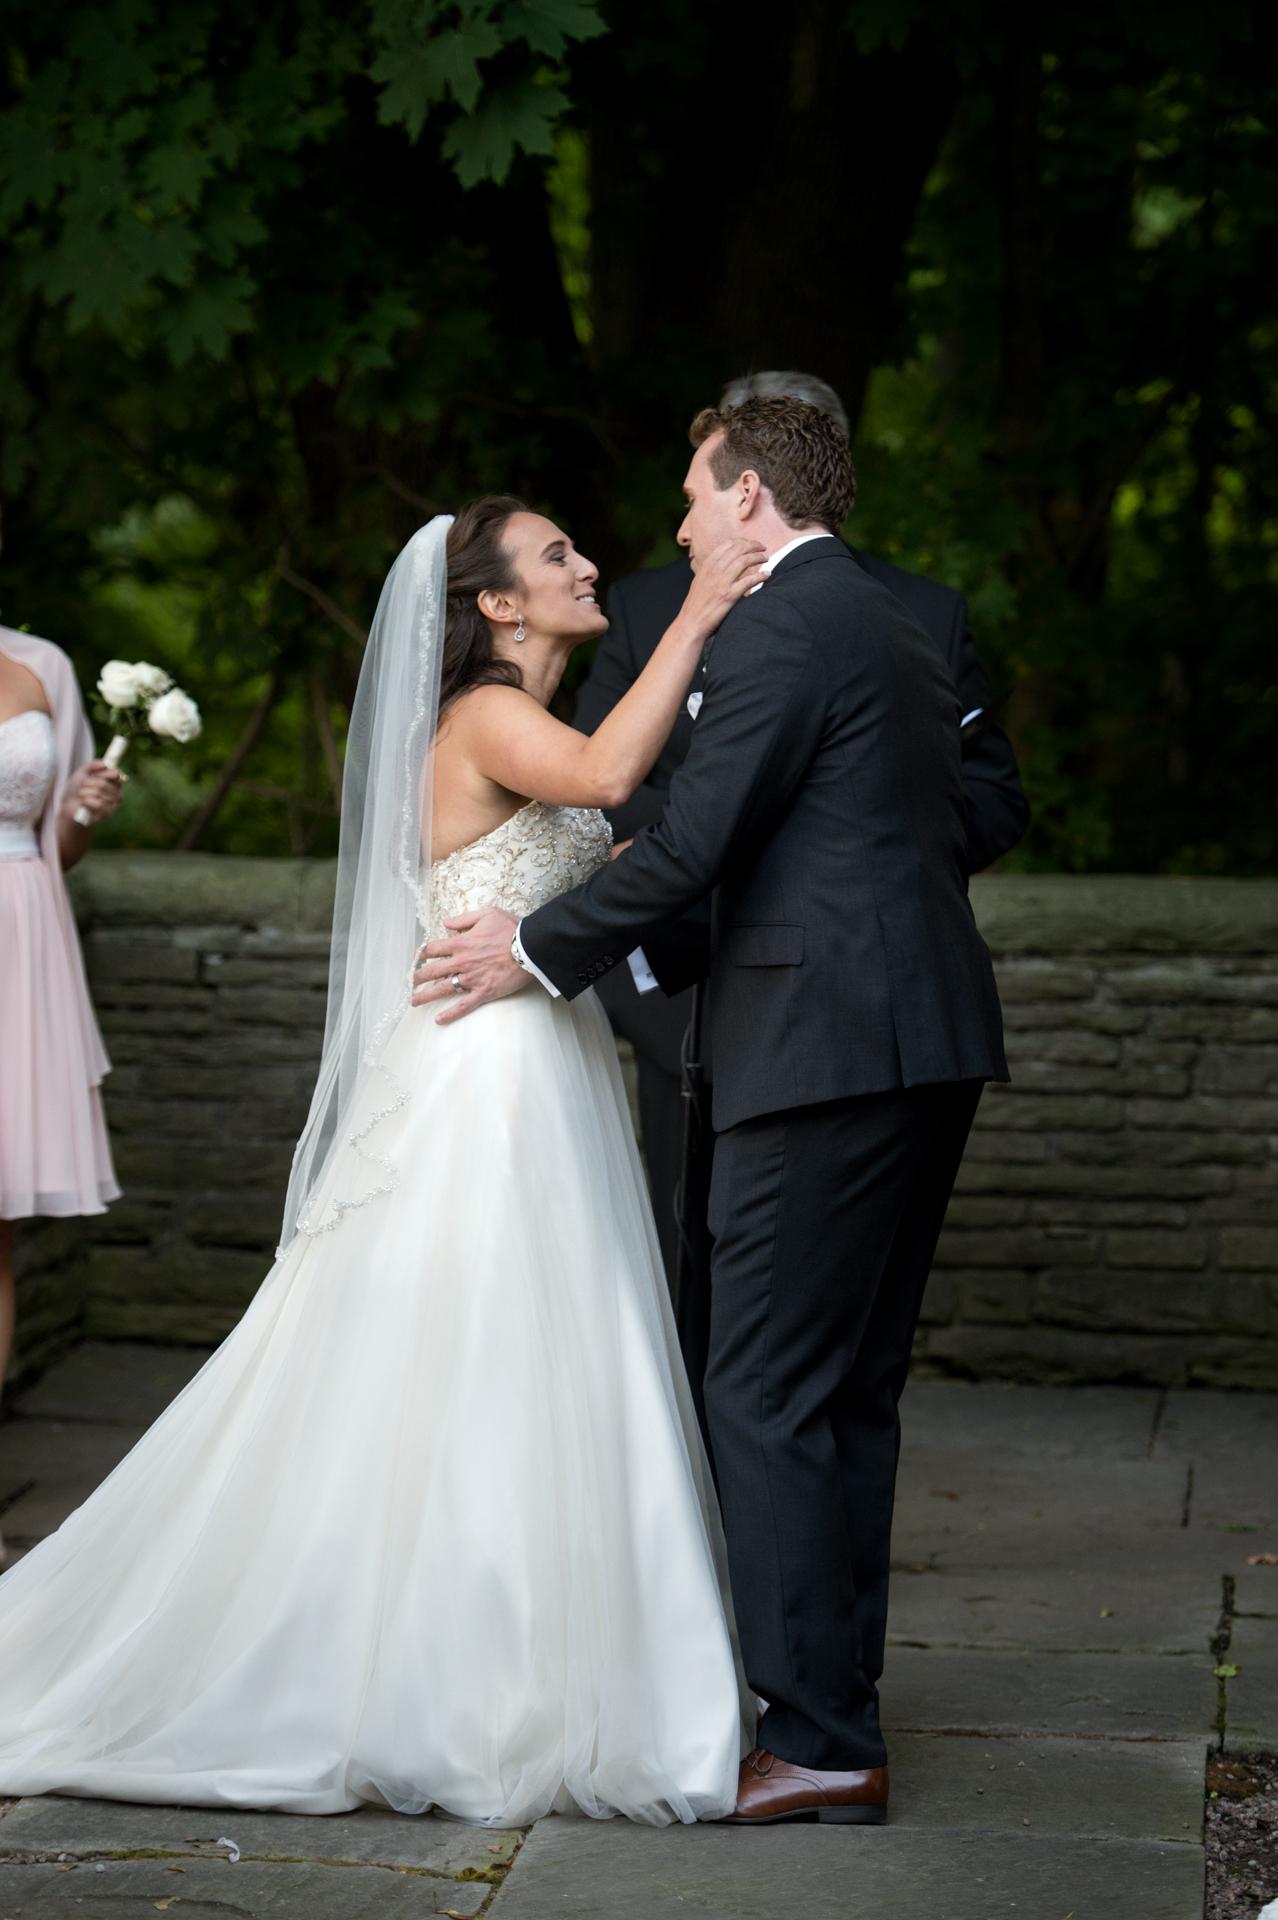 Shaun & Danielle | Sunnybrook Estates Wedding | Vaughn Estate Wedding23